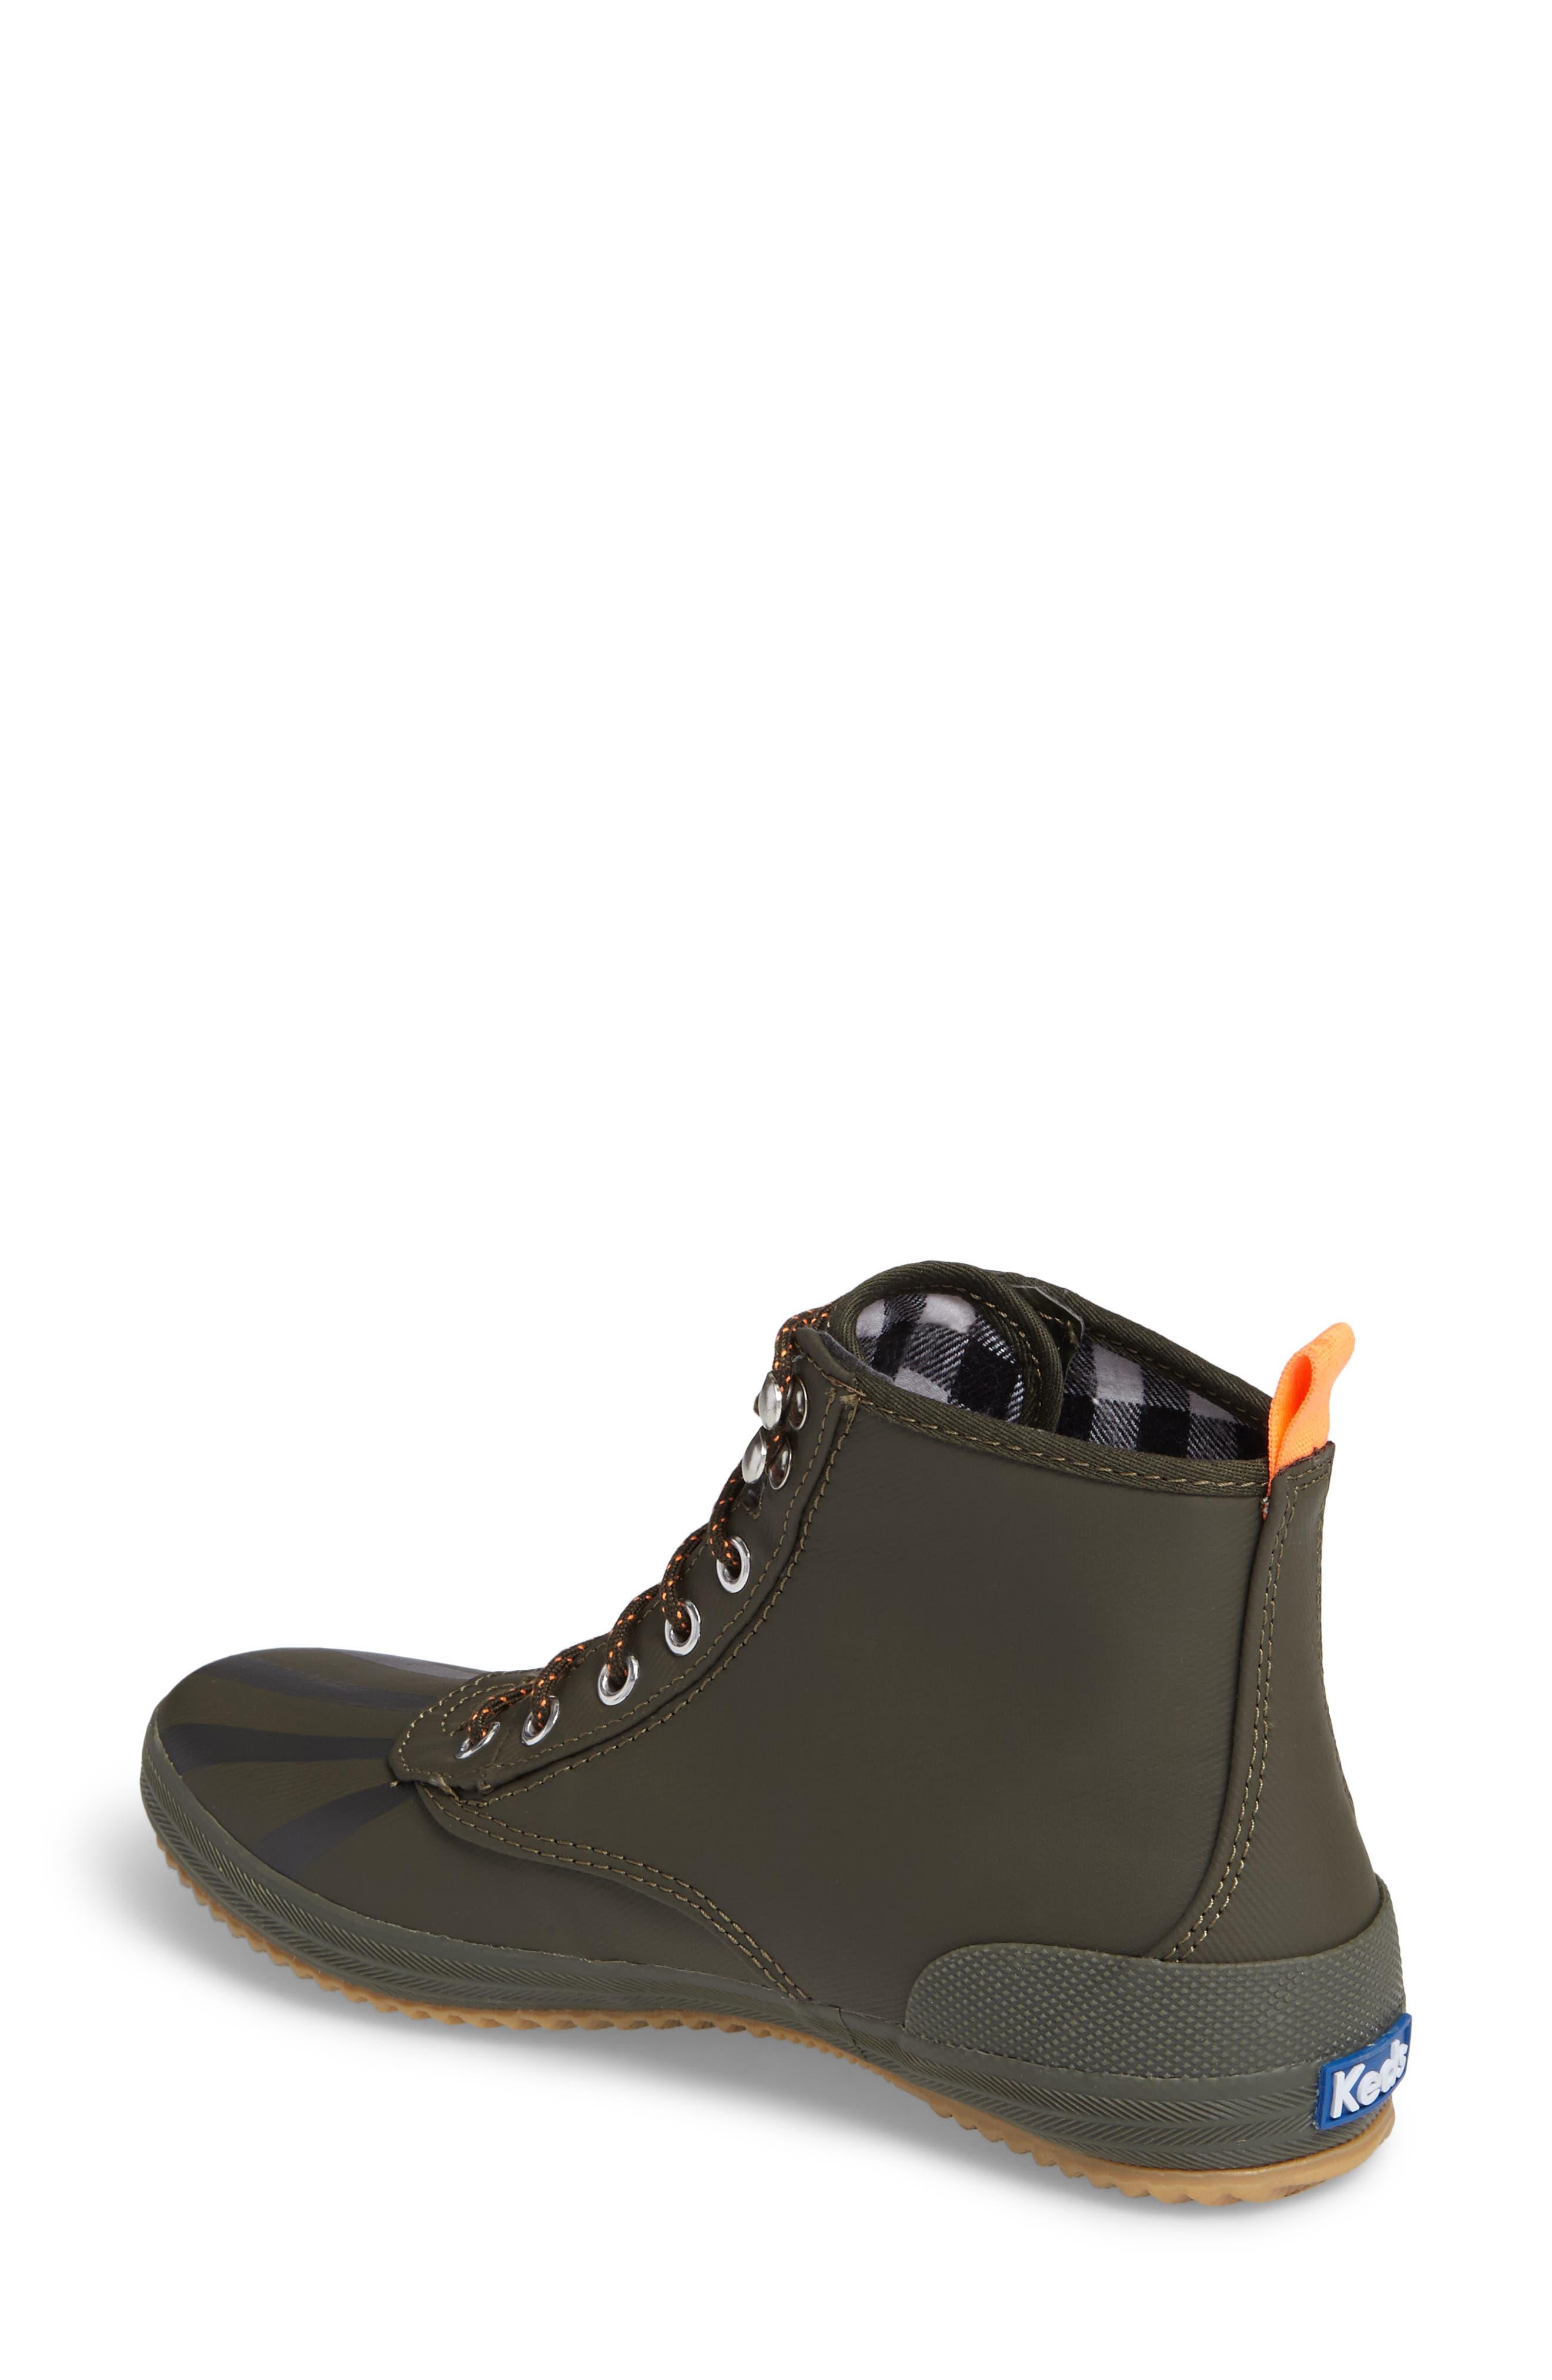 Alternate Image 2  - Keds® Scout Water Repellent Sneaker Boot (Women)